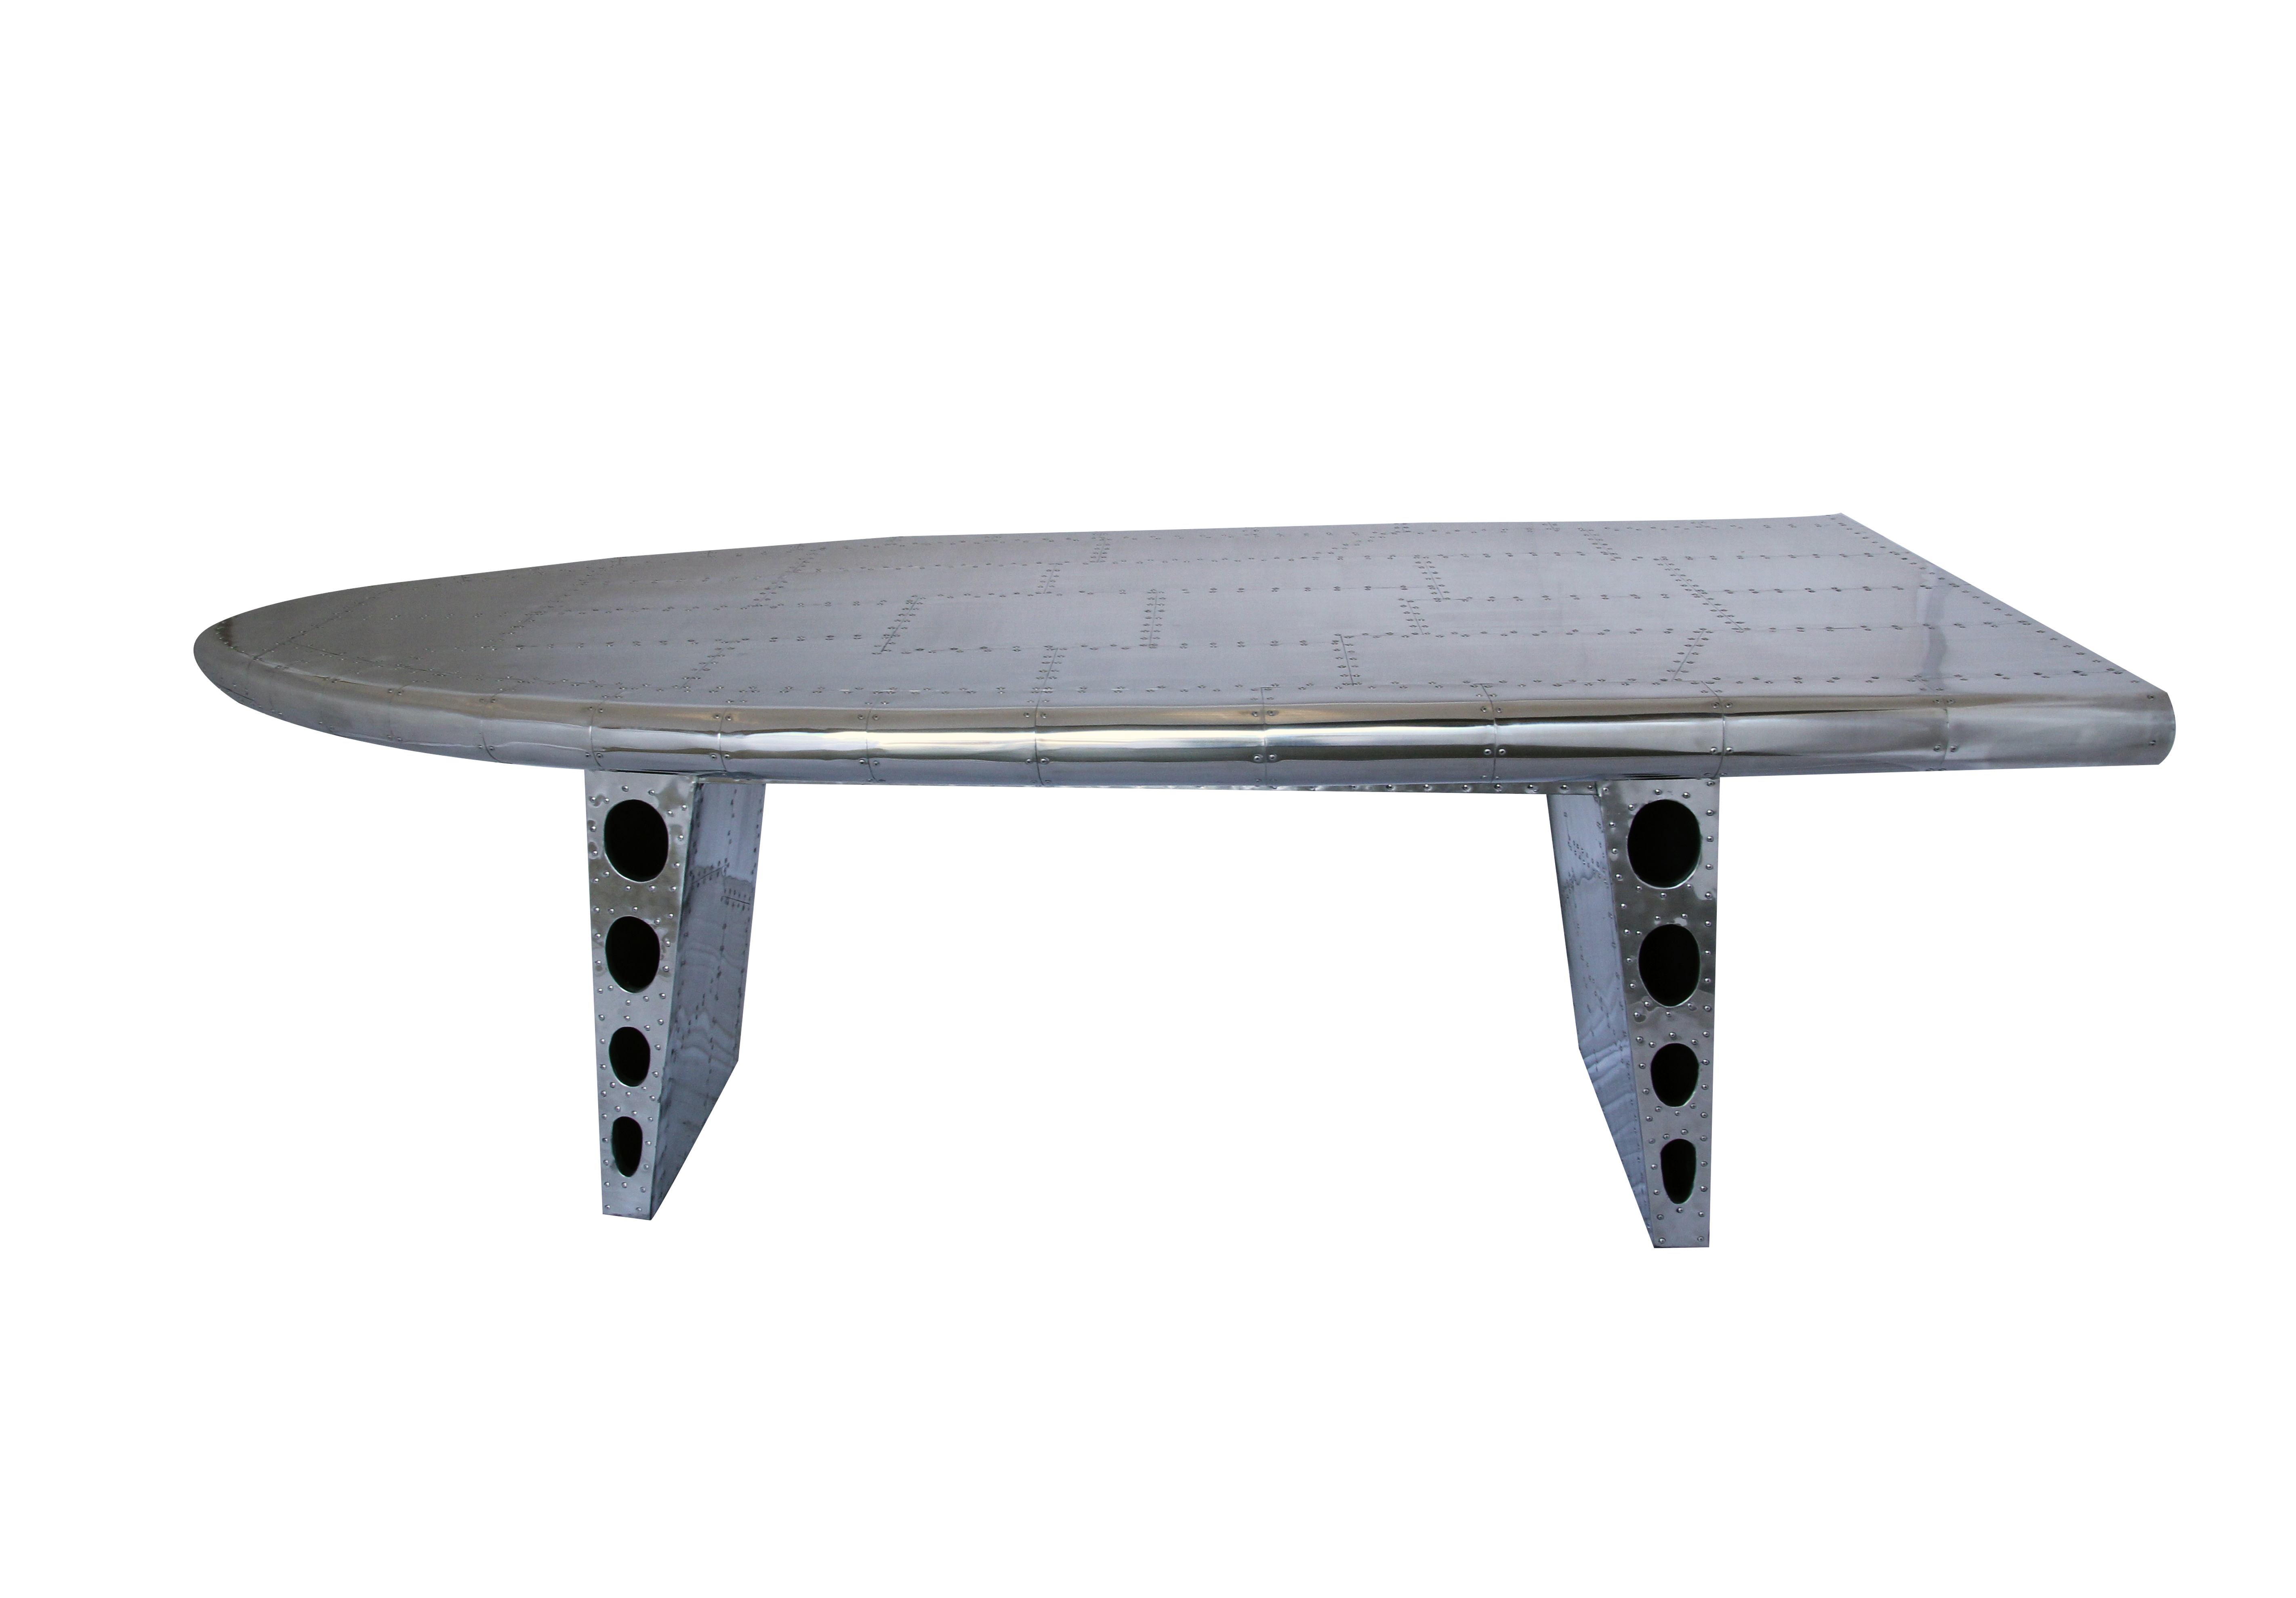 grande table aile d'avion en alu riveté